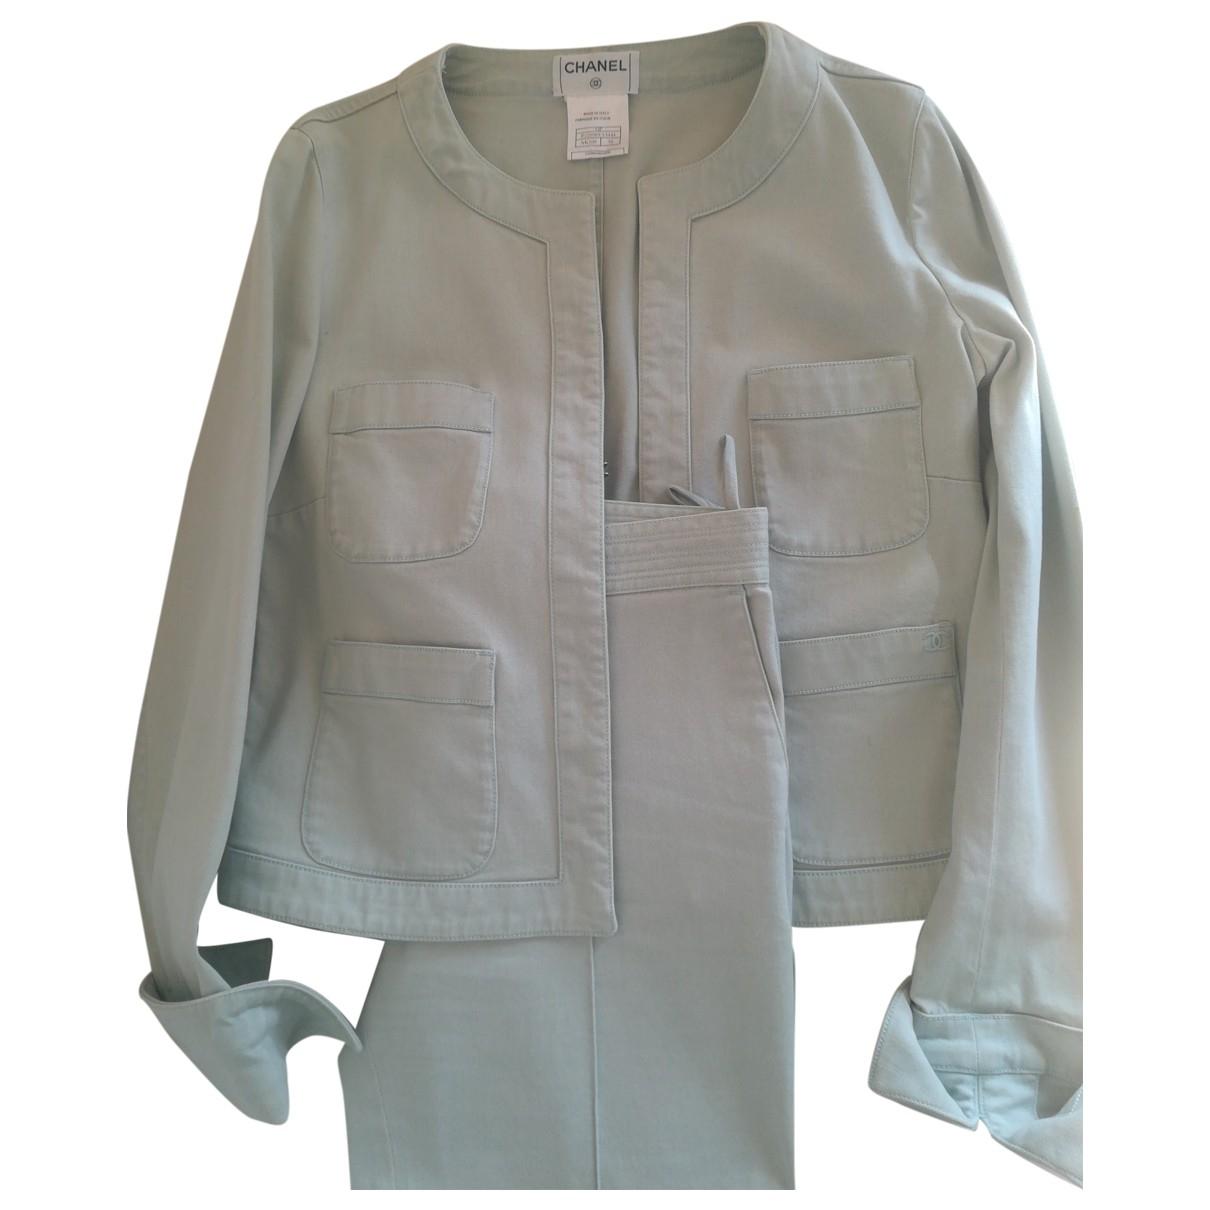 Chanel \N Blue Denim - Jeans jacket for Women 38 FR